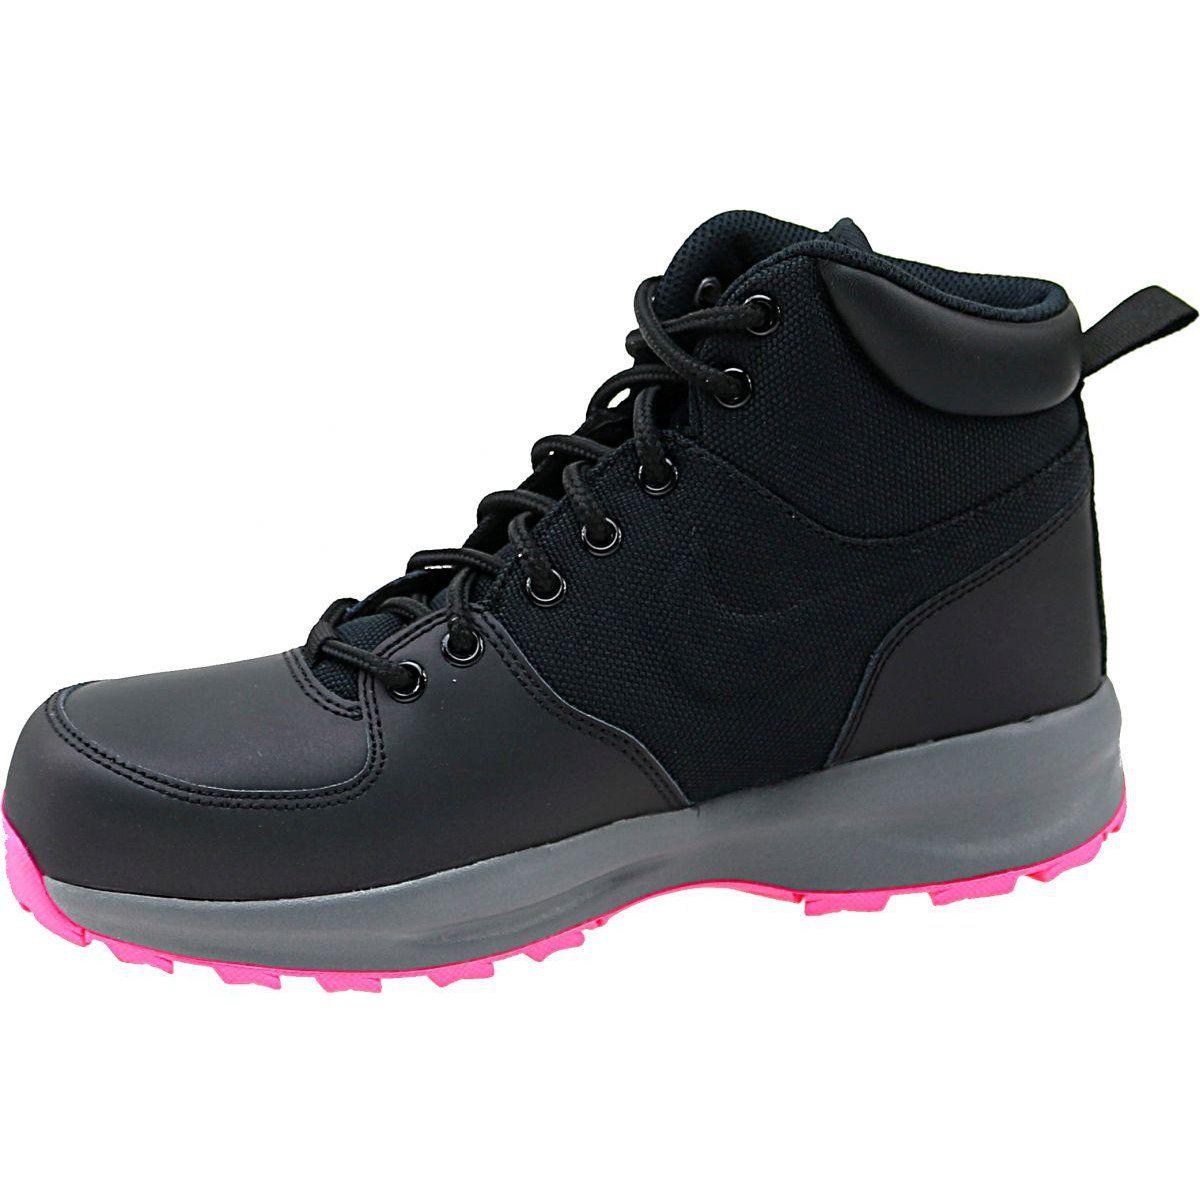 Buty Nike Manoa Lth Gs W 859412 006 Czarne Black Shoes Nike Shoes Women Nike